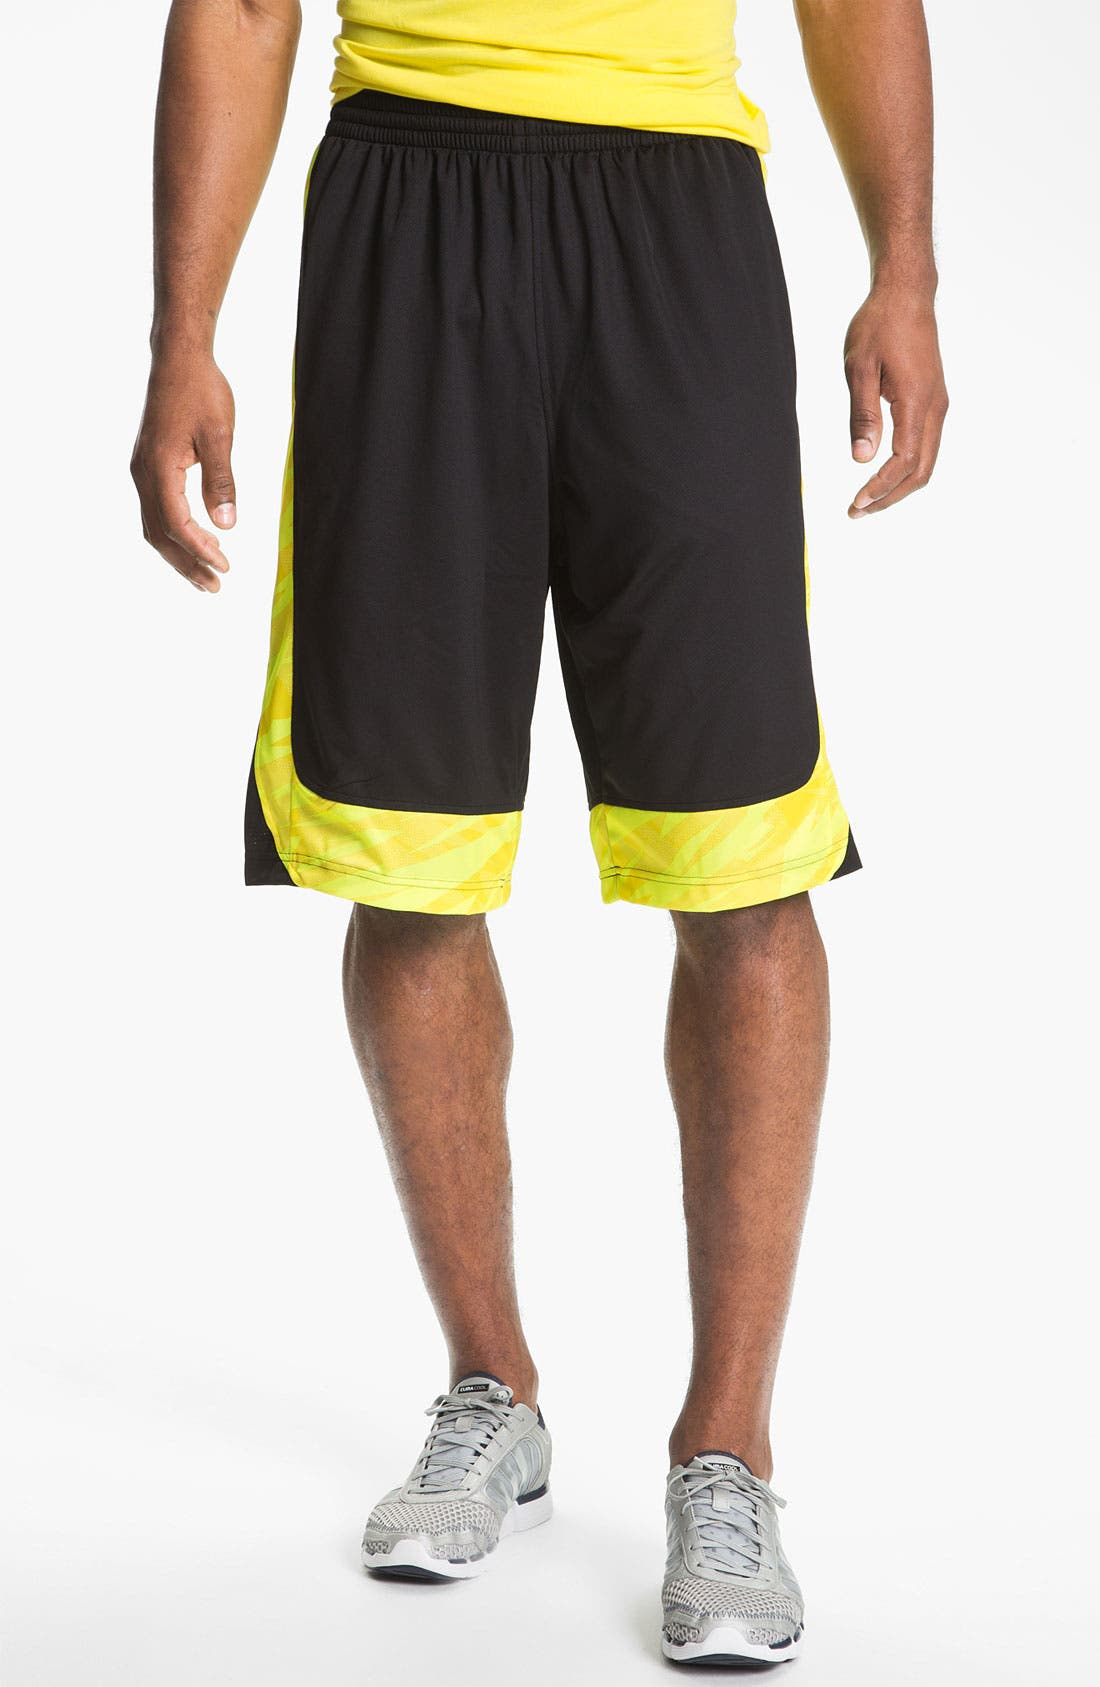 Alternate Image 1 Selected - adidas 'Edge Camo' Shorts